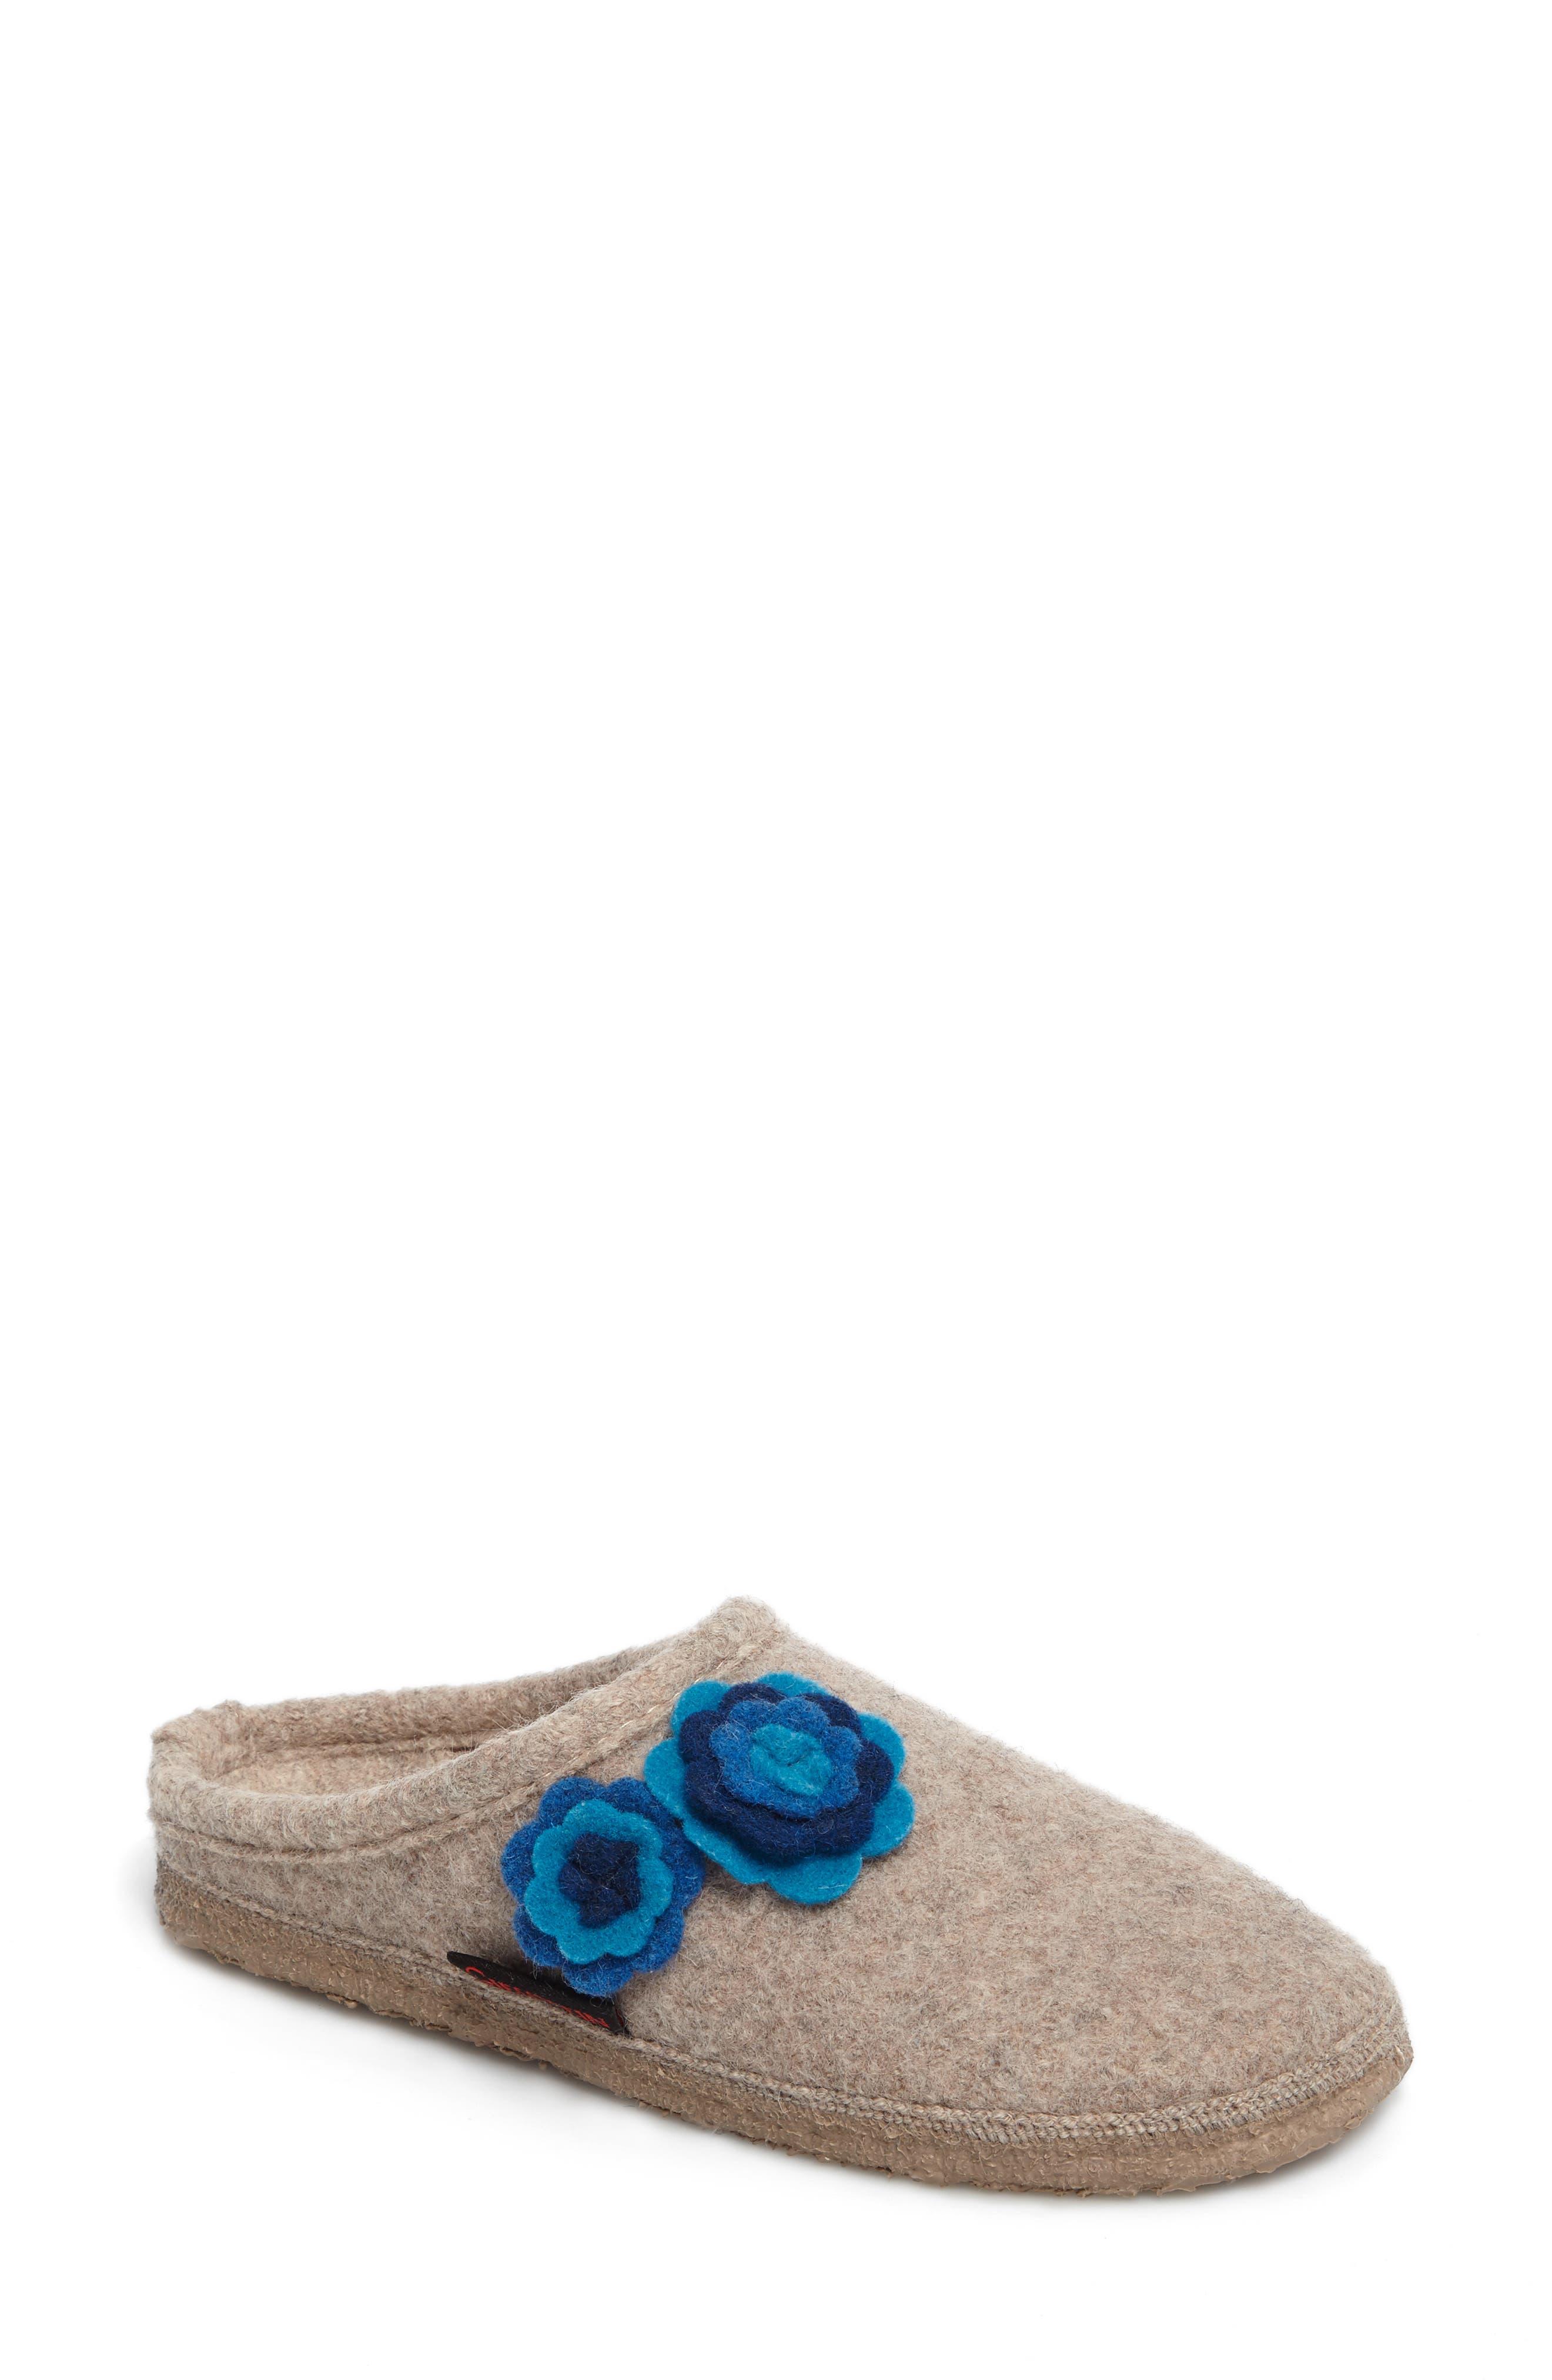 Georgie Indoor Boiled Wool Slipper,                         Main,                         color, NATURAL WOOL